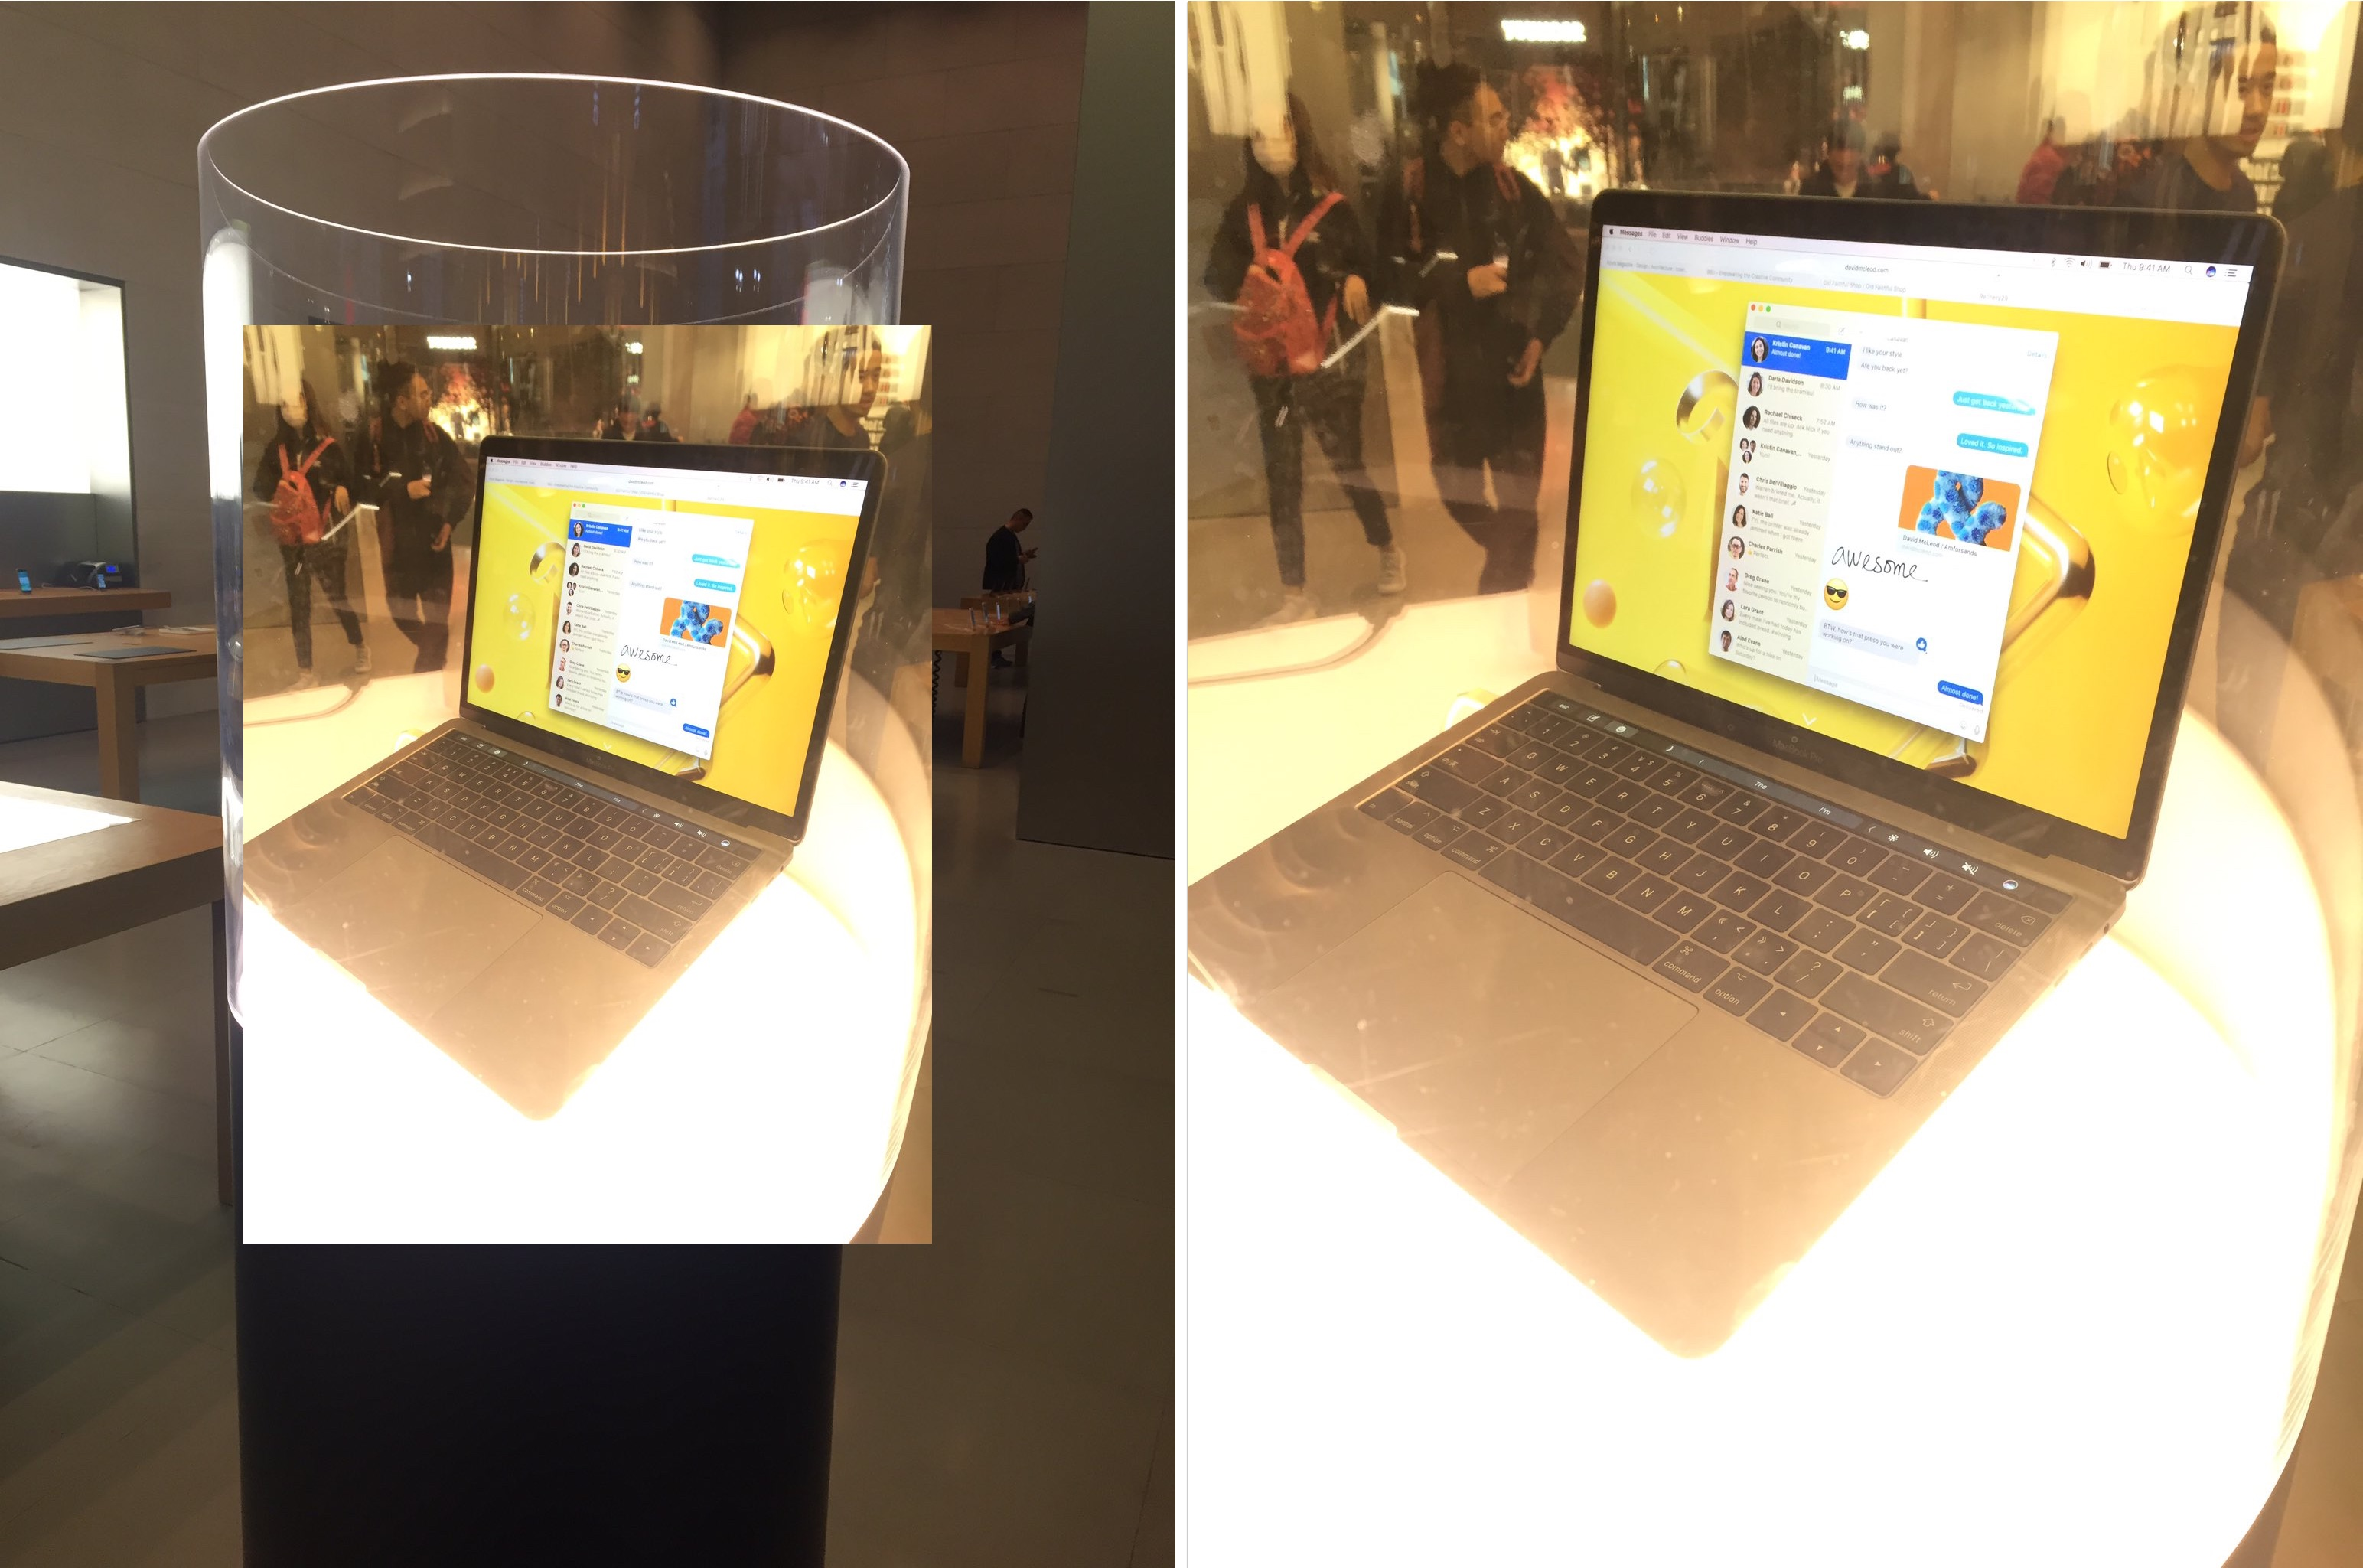 MacBook Pro Touch Bar Apple Nanjing Road image 001